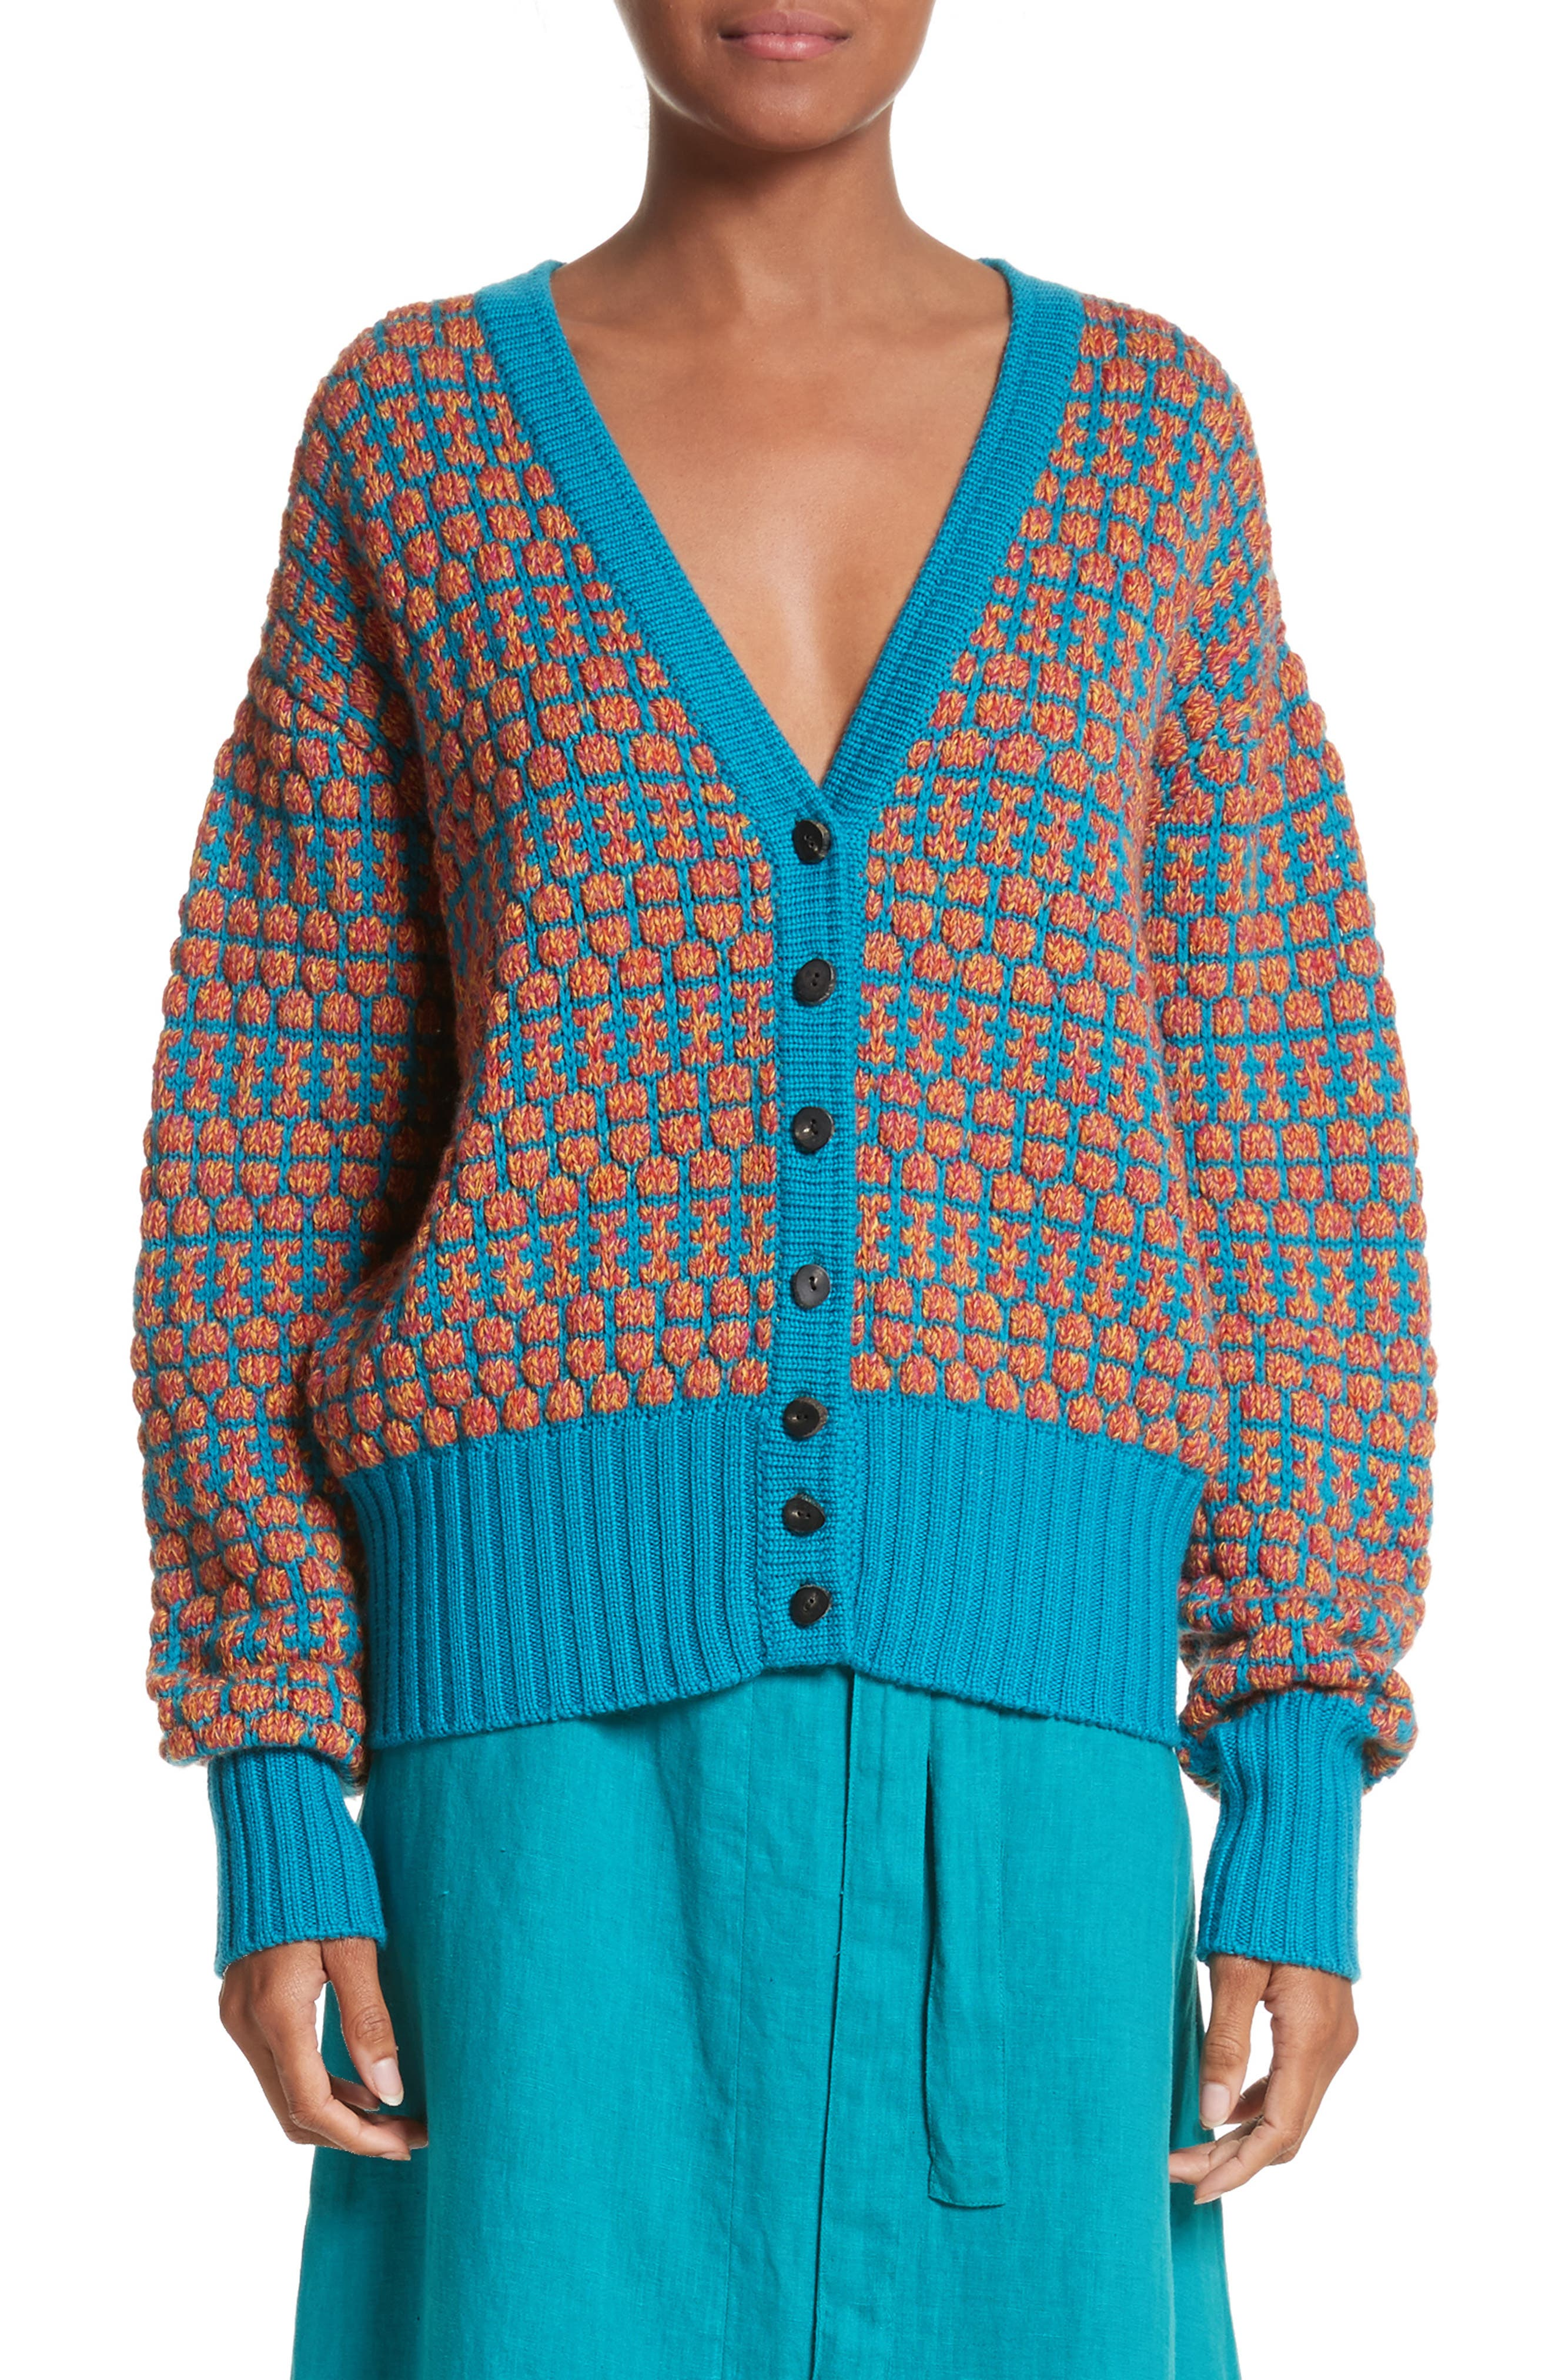 Alternate Image 1 Selected - Simon Miller Izee Floral Button Cardigan